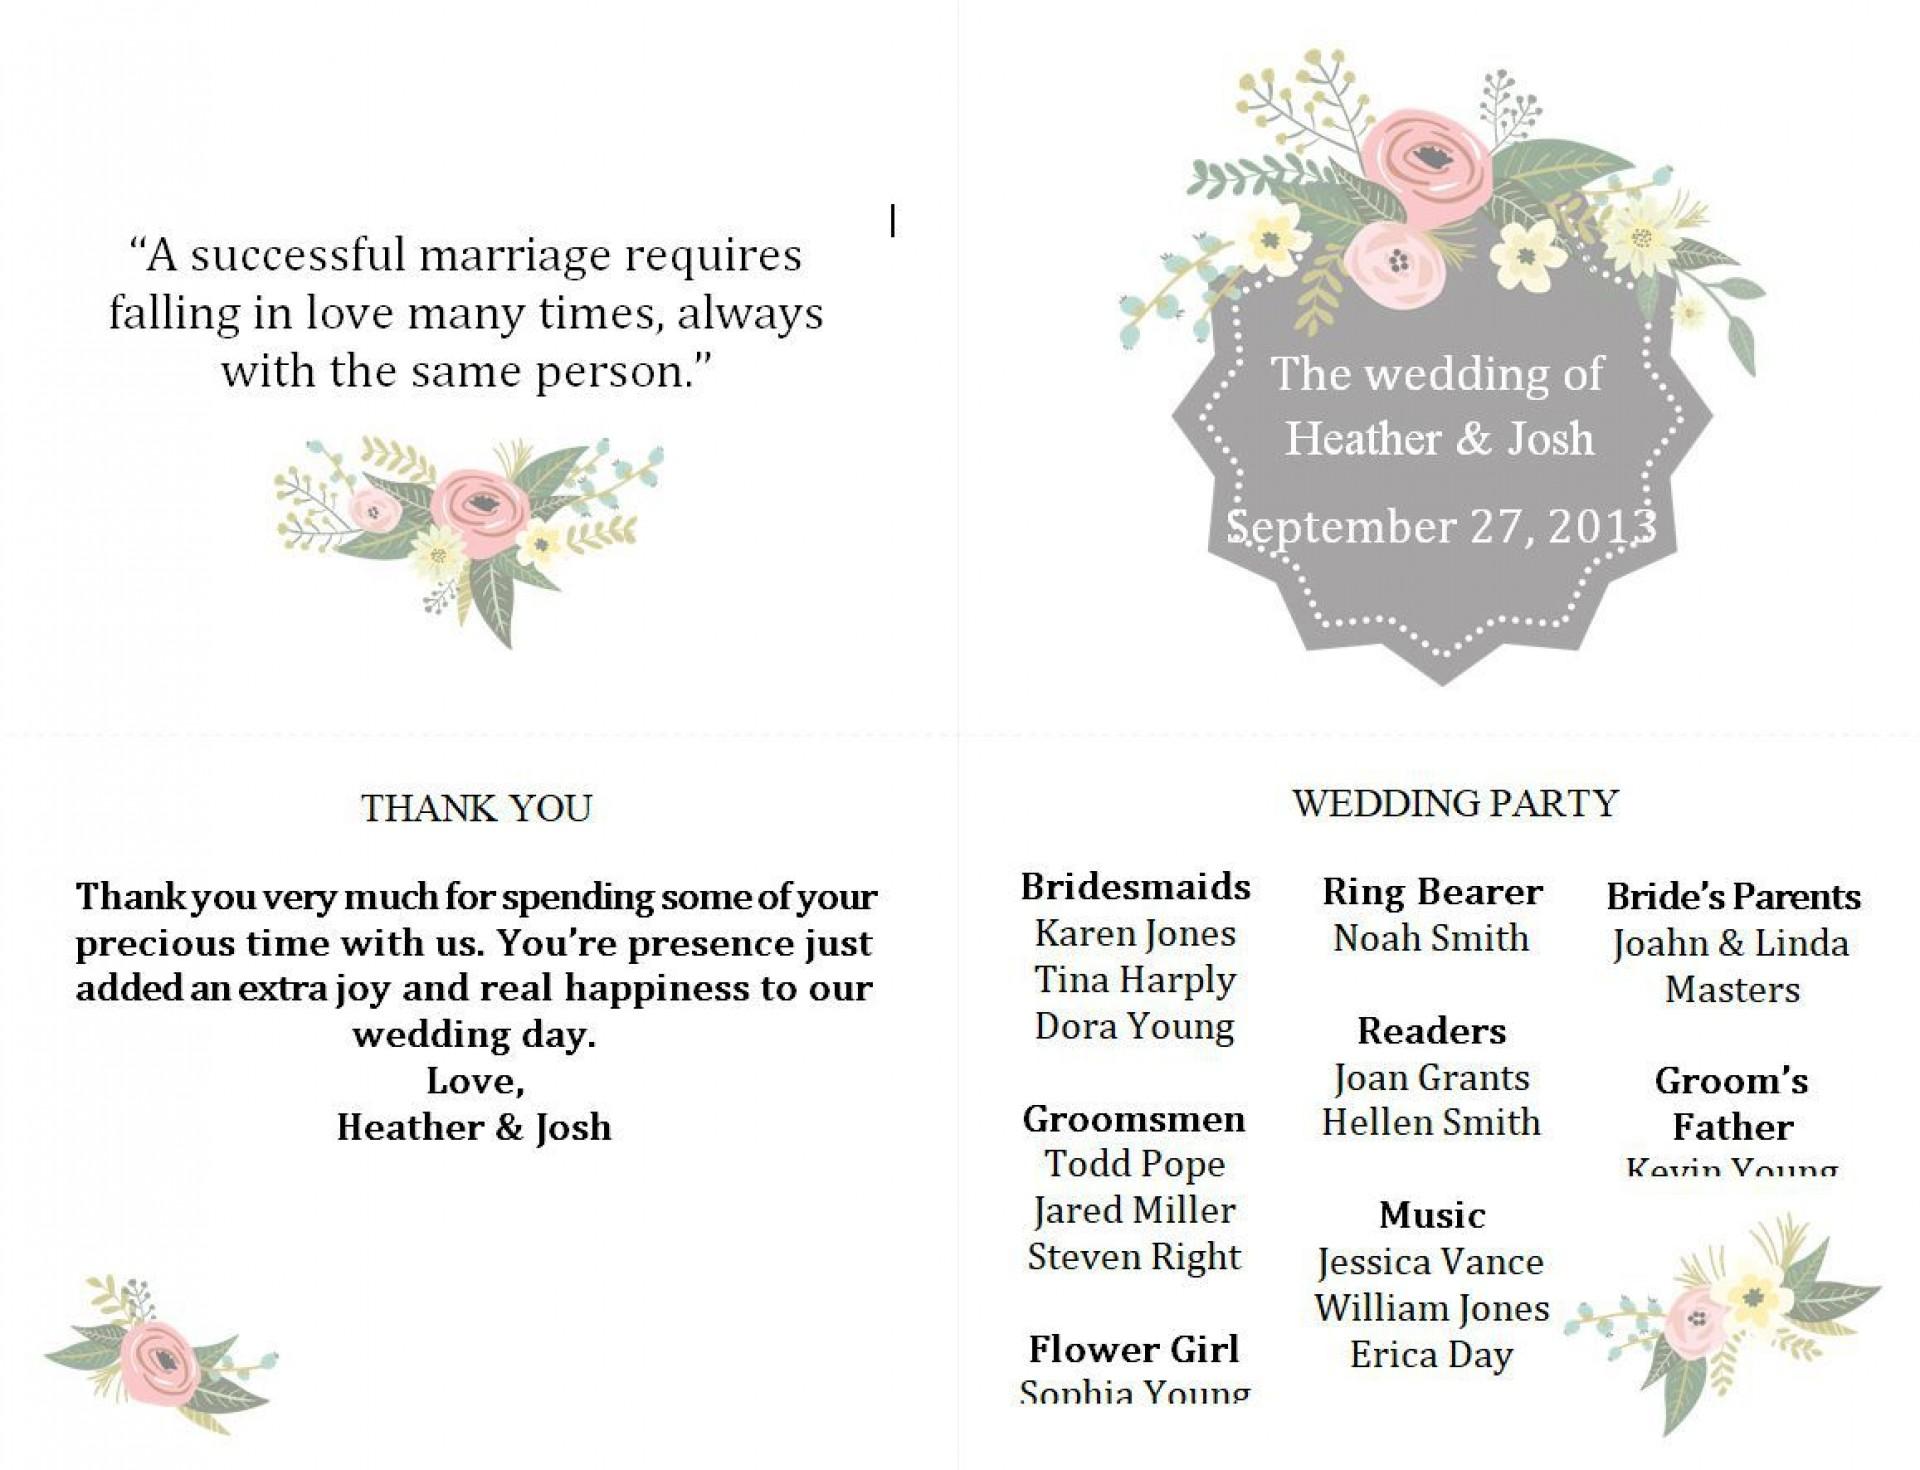 006 Unbelievable Wedding Program Template Word Concept  Catholic Mas Sample Wording Idea Example Simple1920